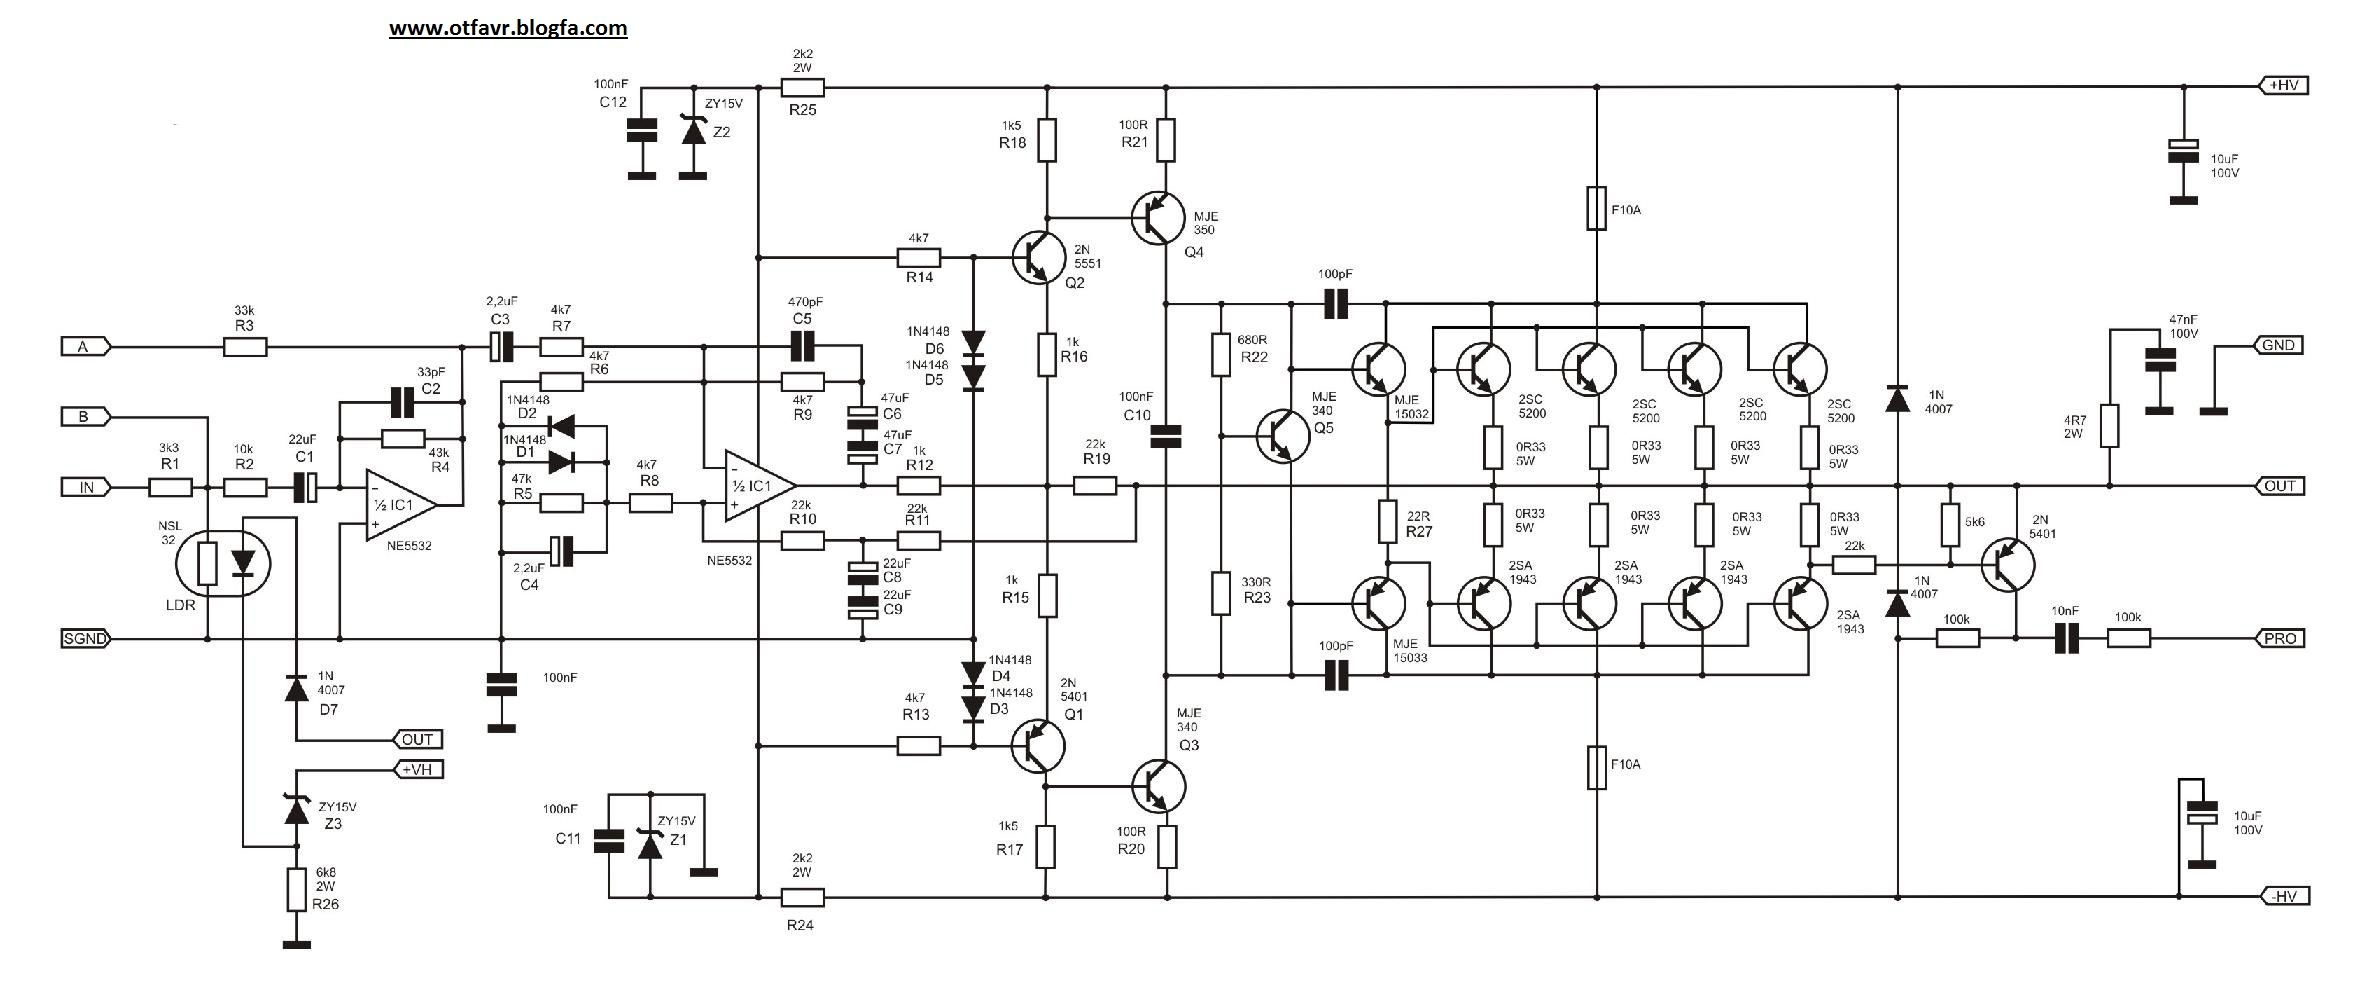 500w power amplifier circuit diagrams nodasystech com 500w power amplifier circuit diagrams nodasystech com [ 2378 x 996 Pixel ]